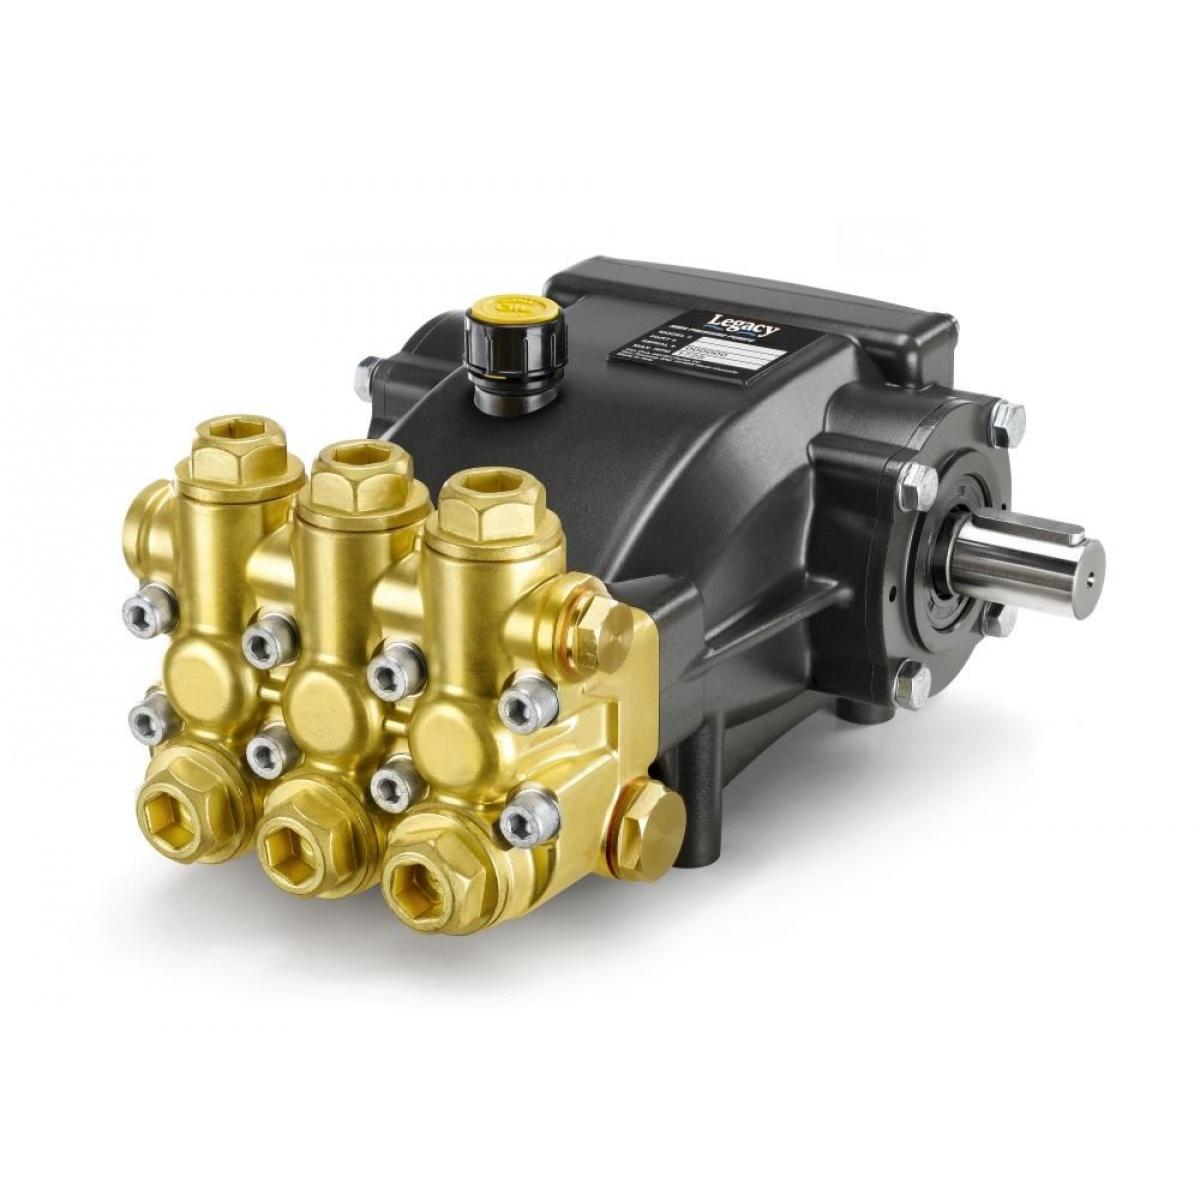 Pump, Legacy Gm4035r.3, 4.8@3500 1500rpm